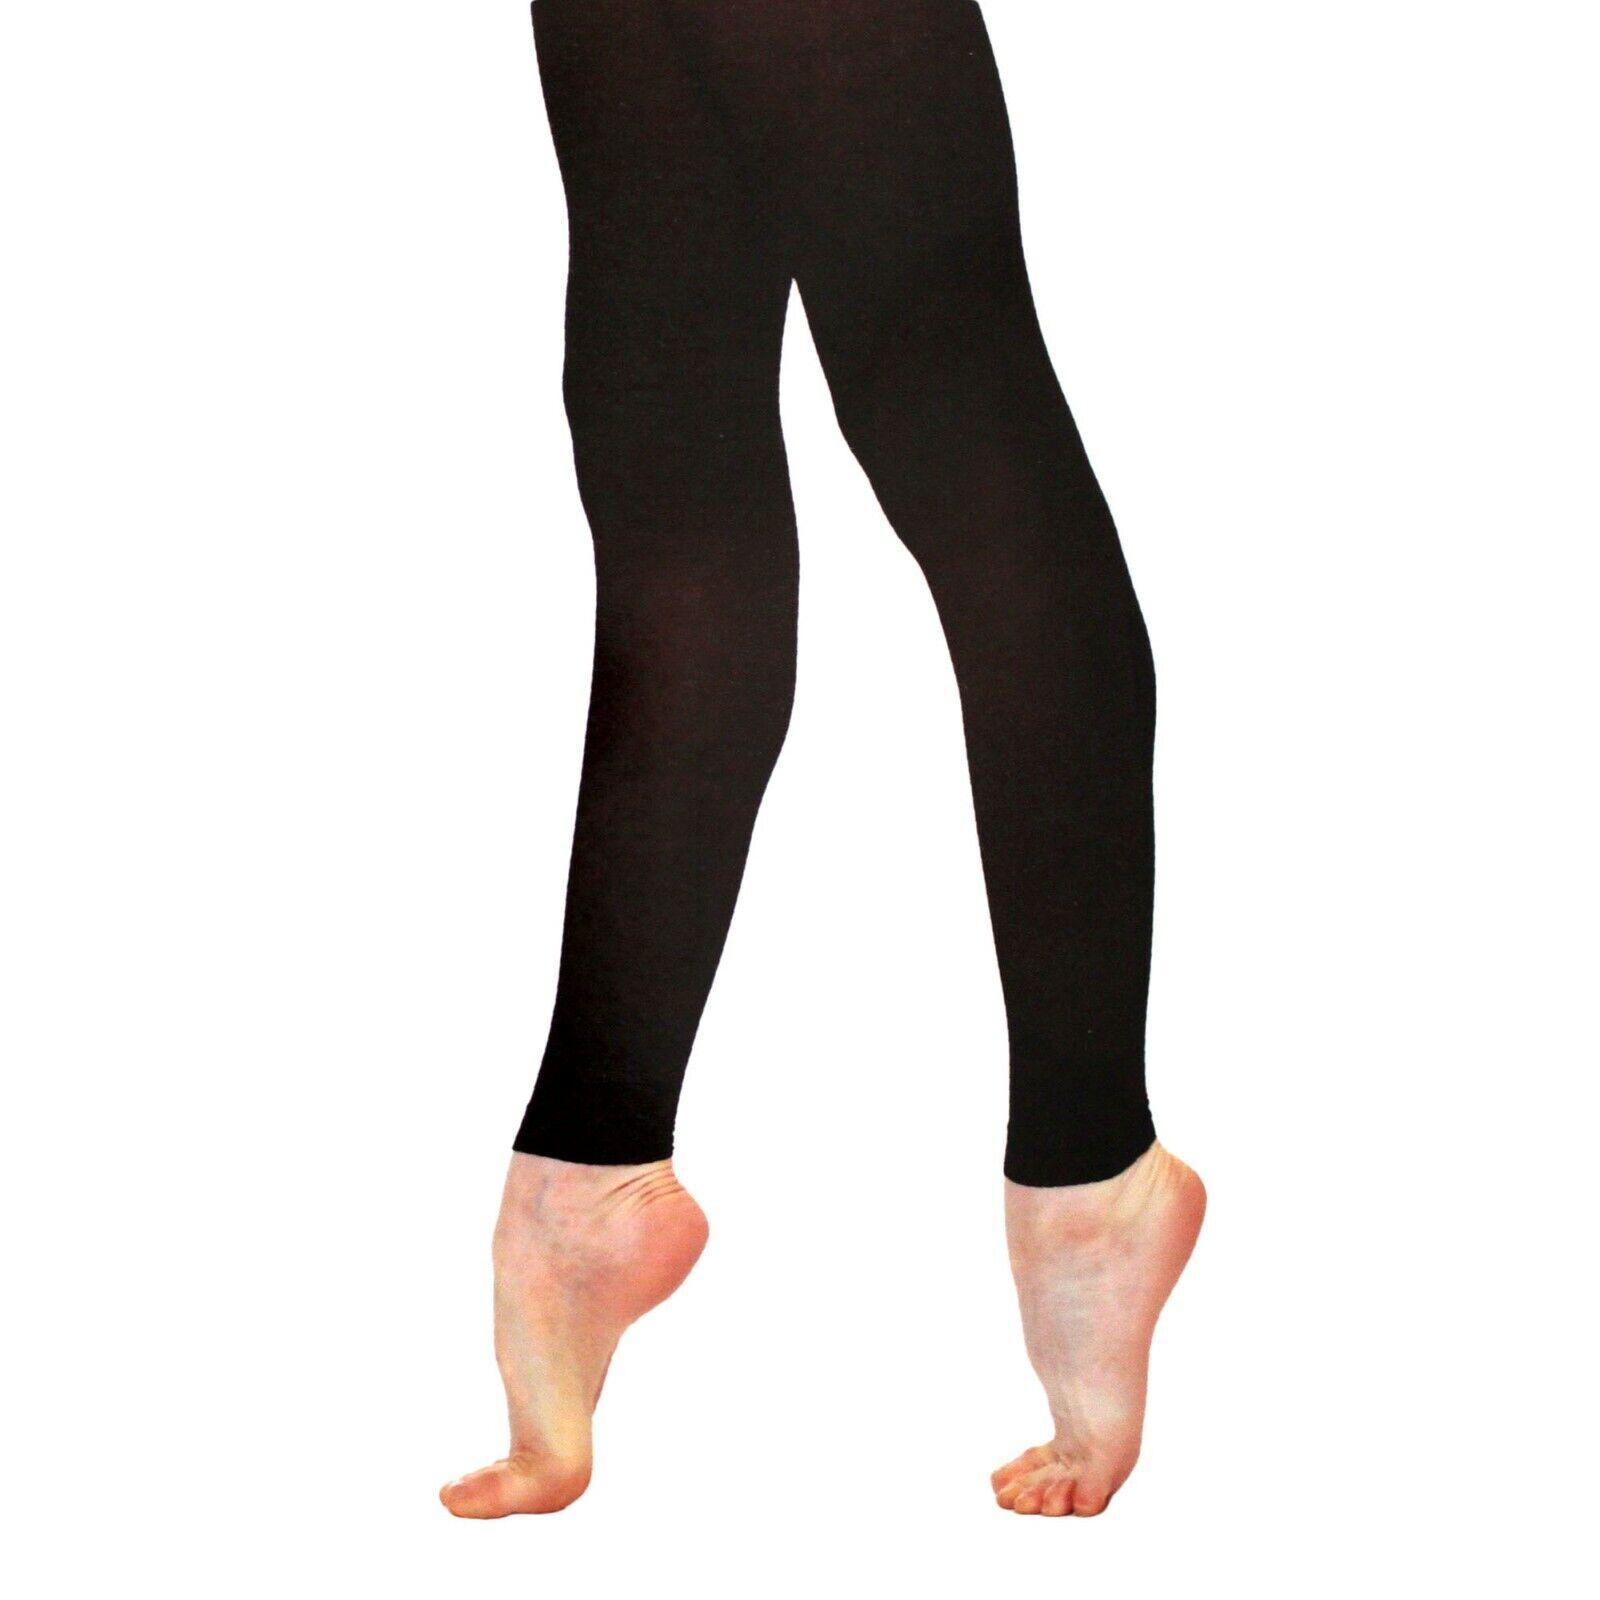 Girls High Quality 60 Denier Footless Ballet Dance Tights Age 3-5Yrs 5-7Yrs TAN